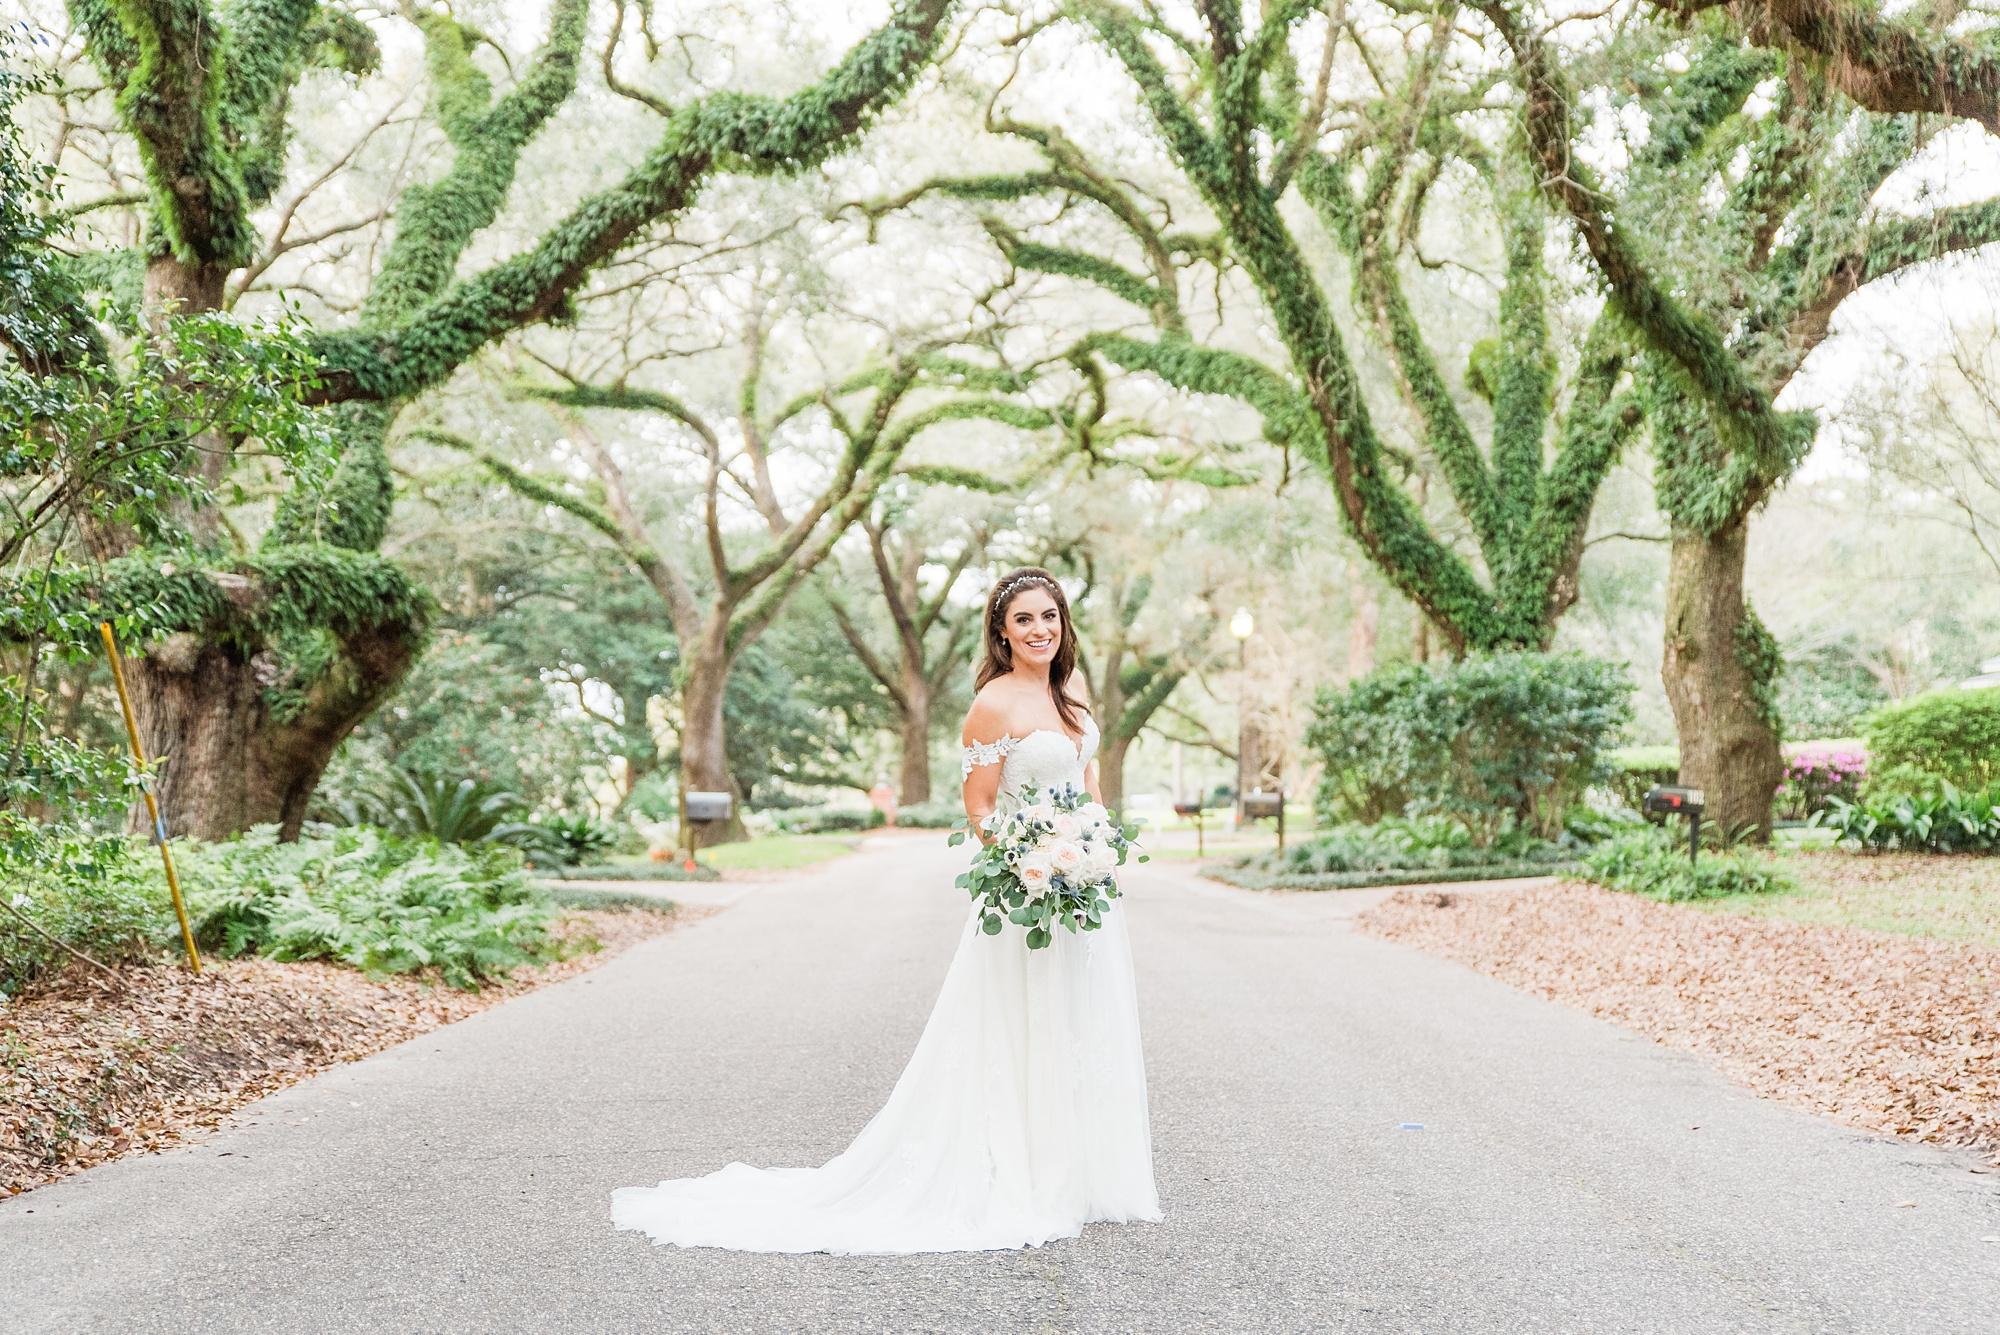 Alabama bridal portraits with Goodie and Smith Weddings